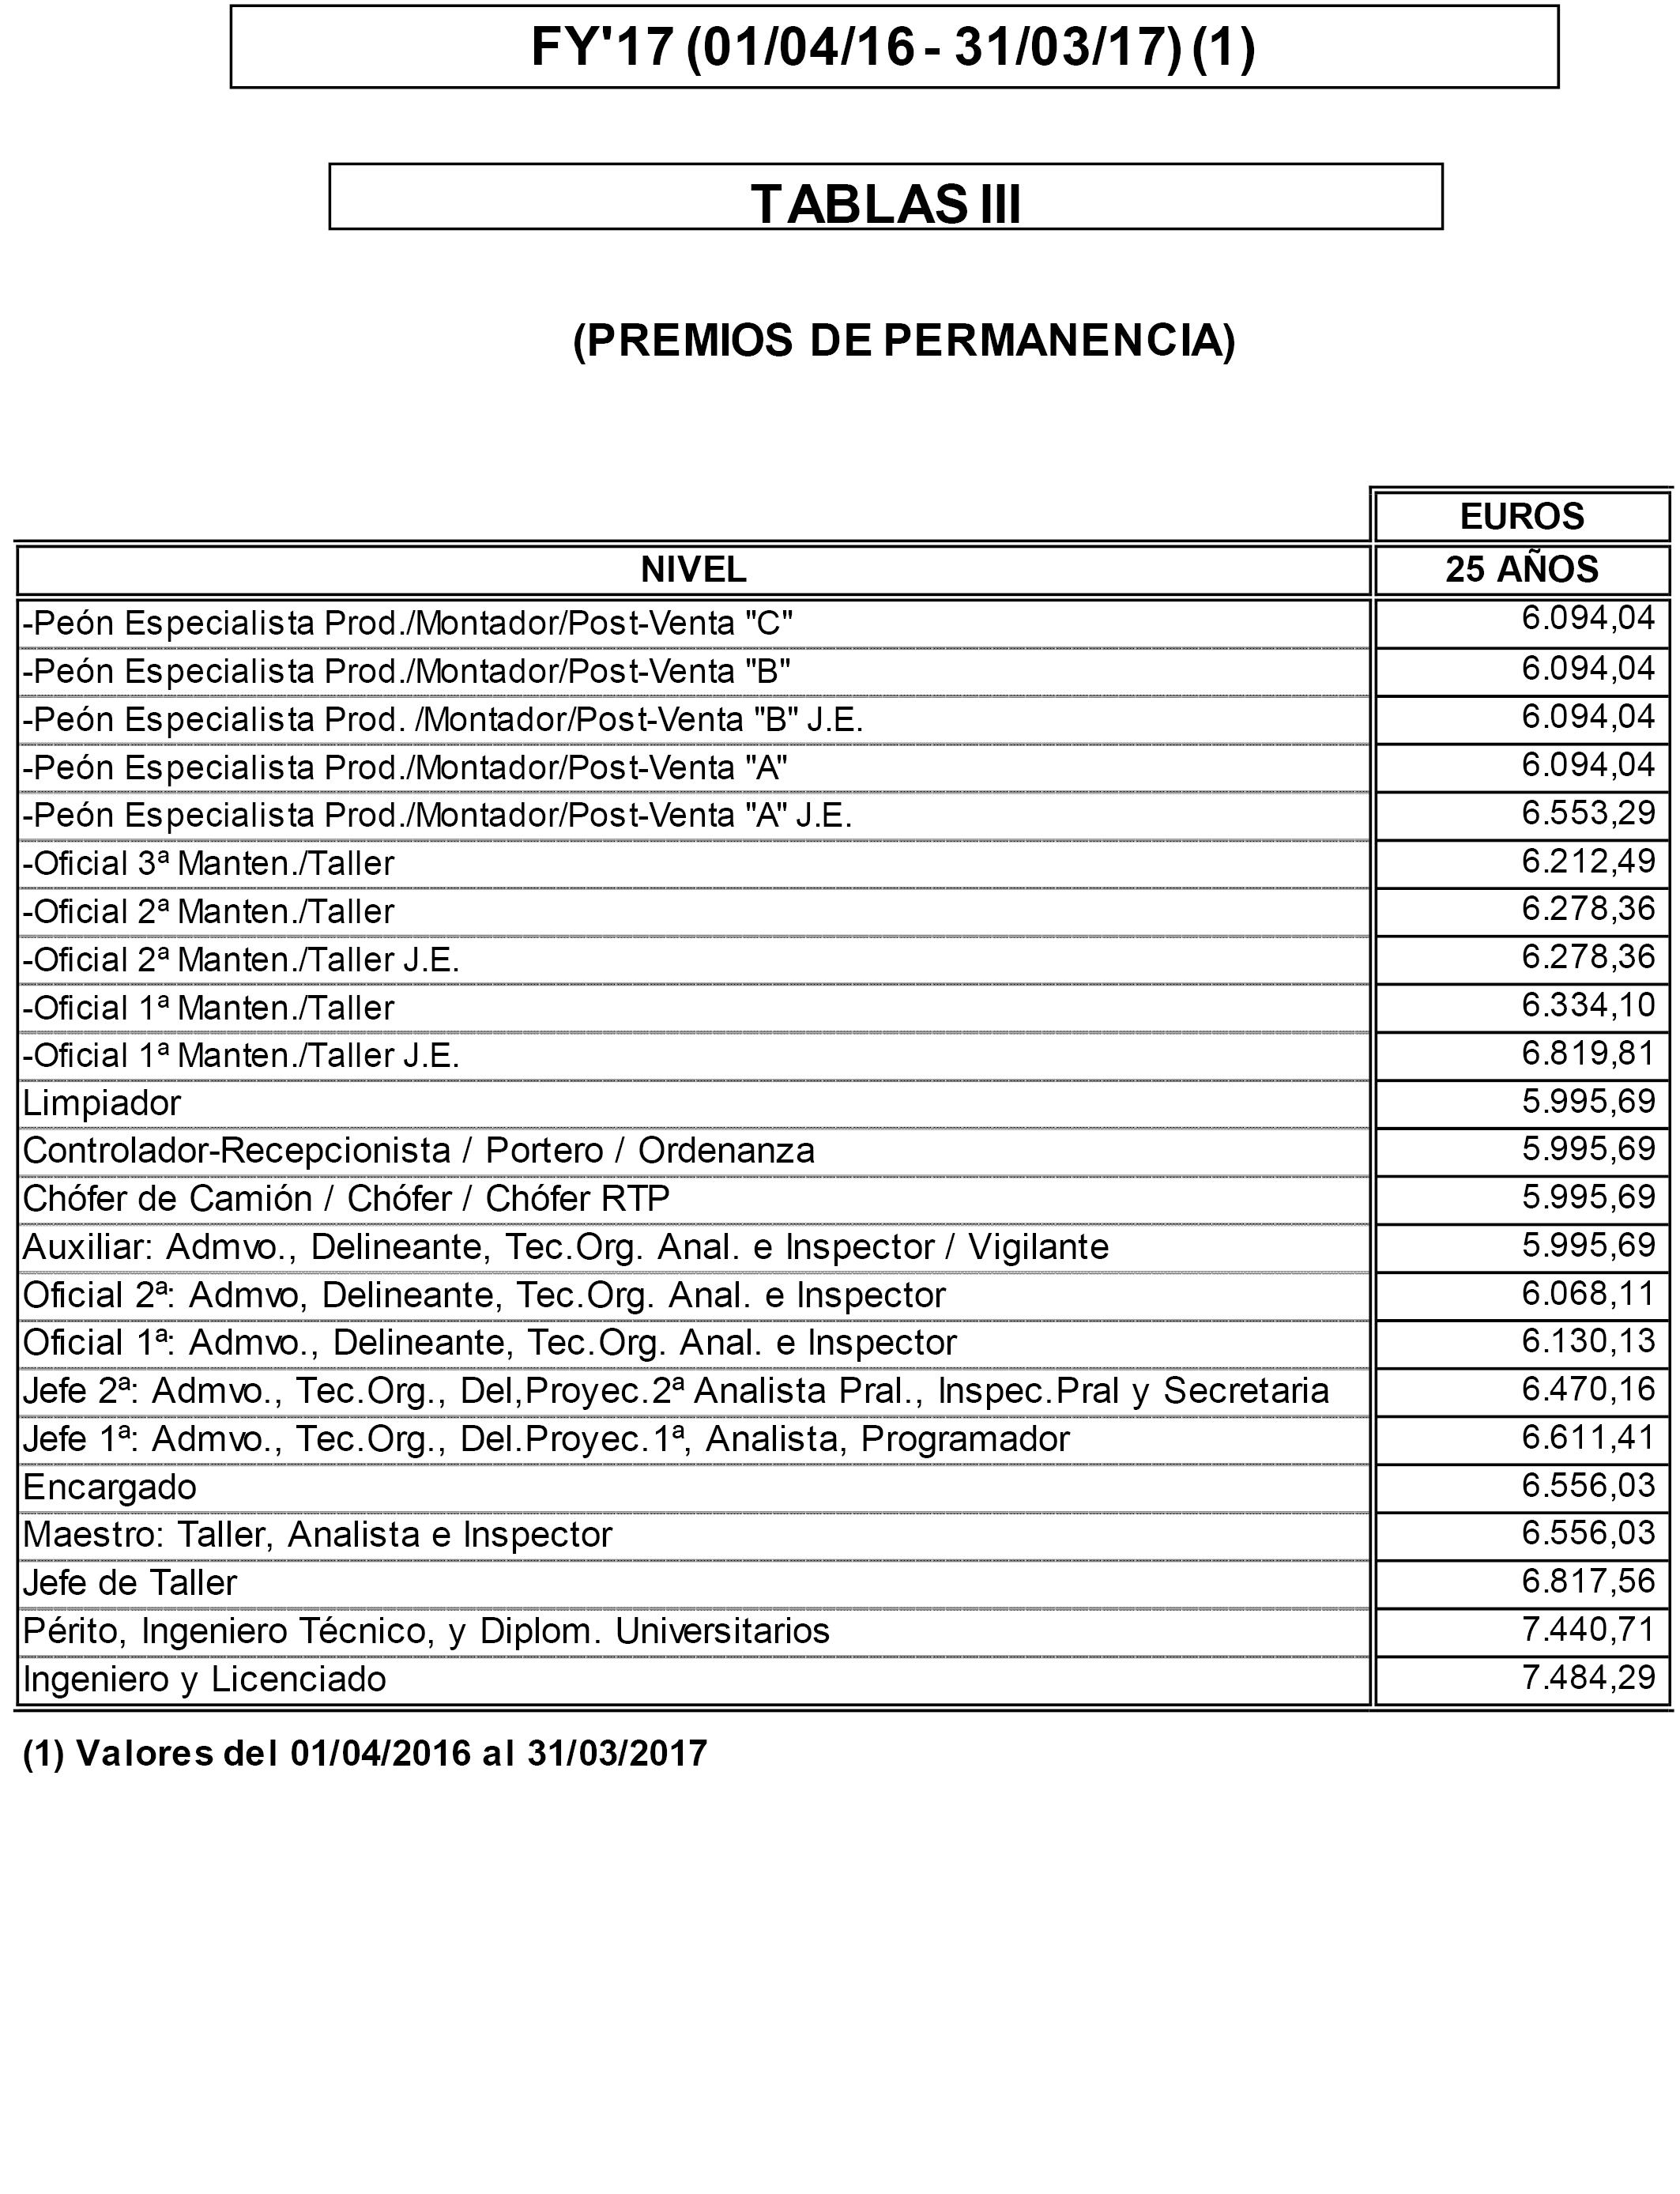 BOE.es - Documento BOE-A-2017-1930